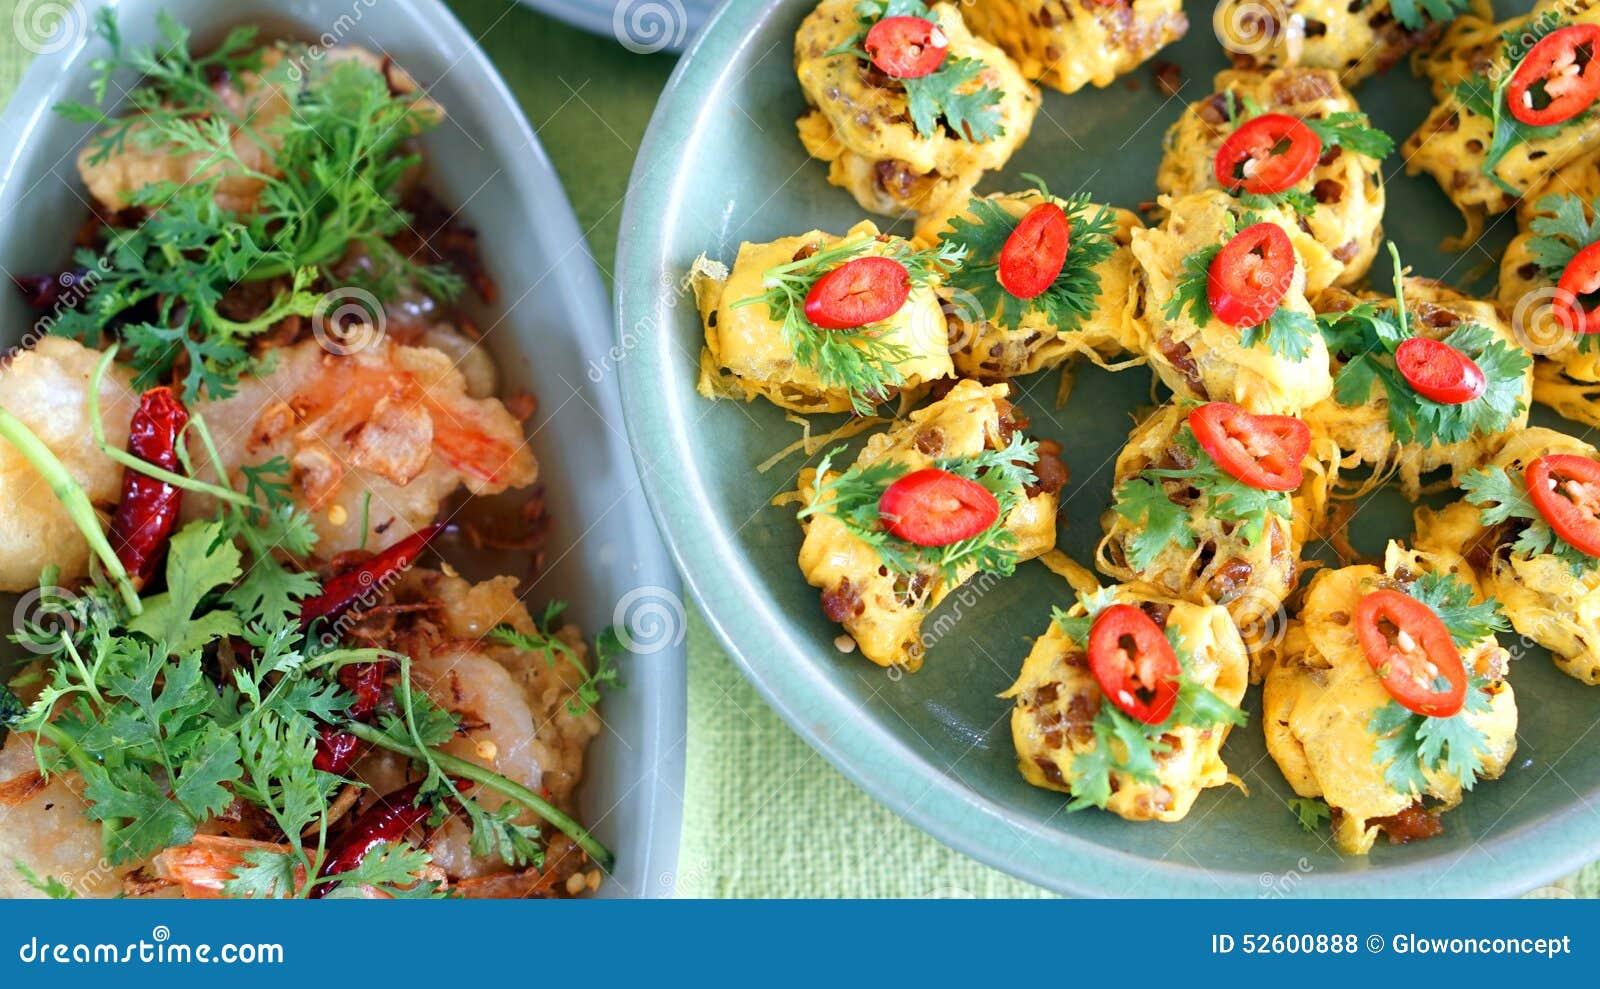 Related keywords suggestions for international foods cuisine - Best international cuisine ...